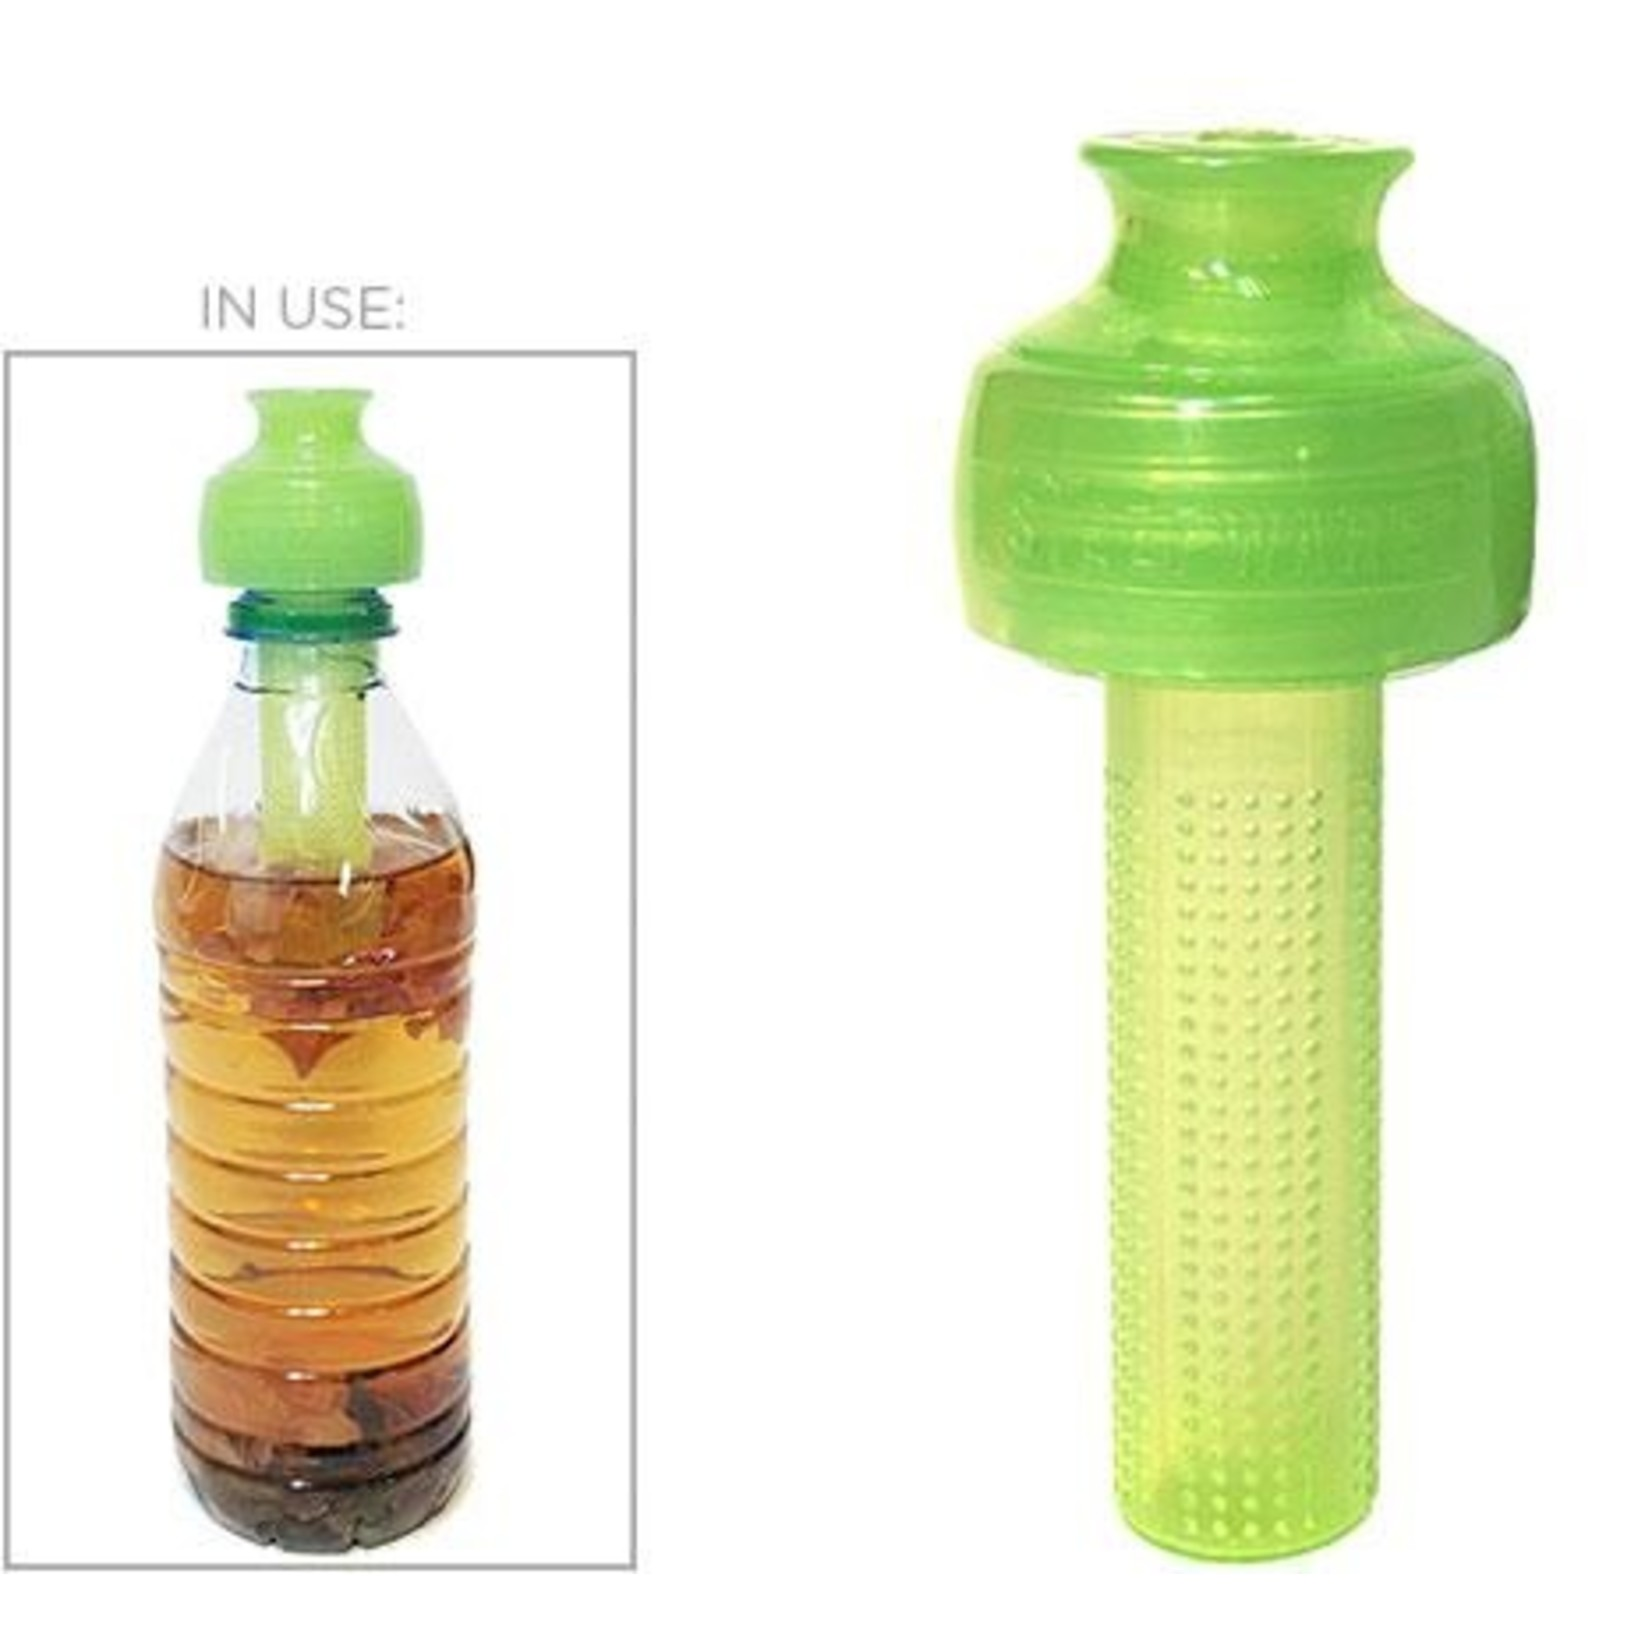 Tea Tonic Tea Tonic Cold Brew Tea Bottle Infuser - Green